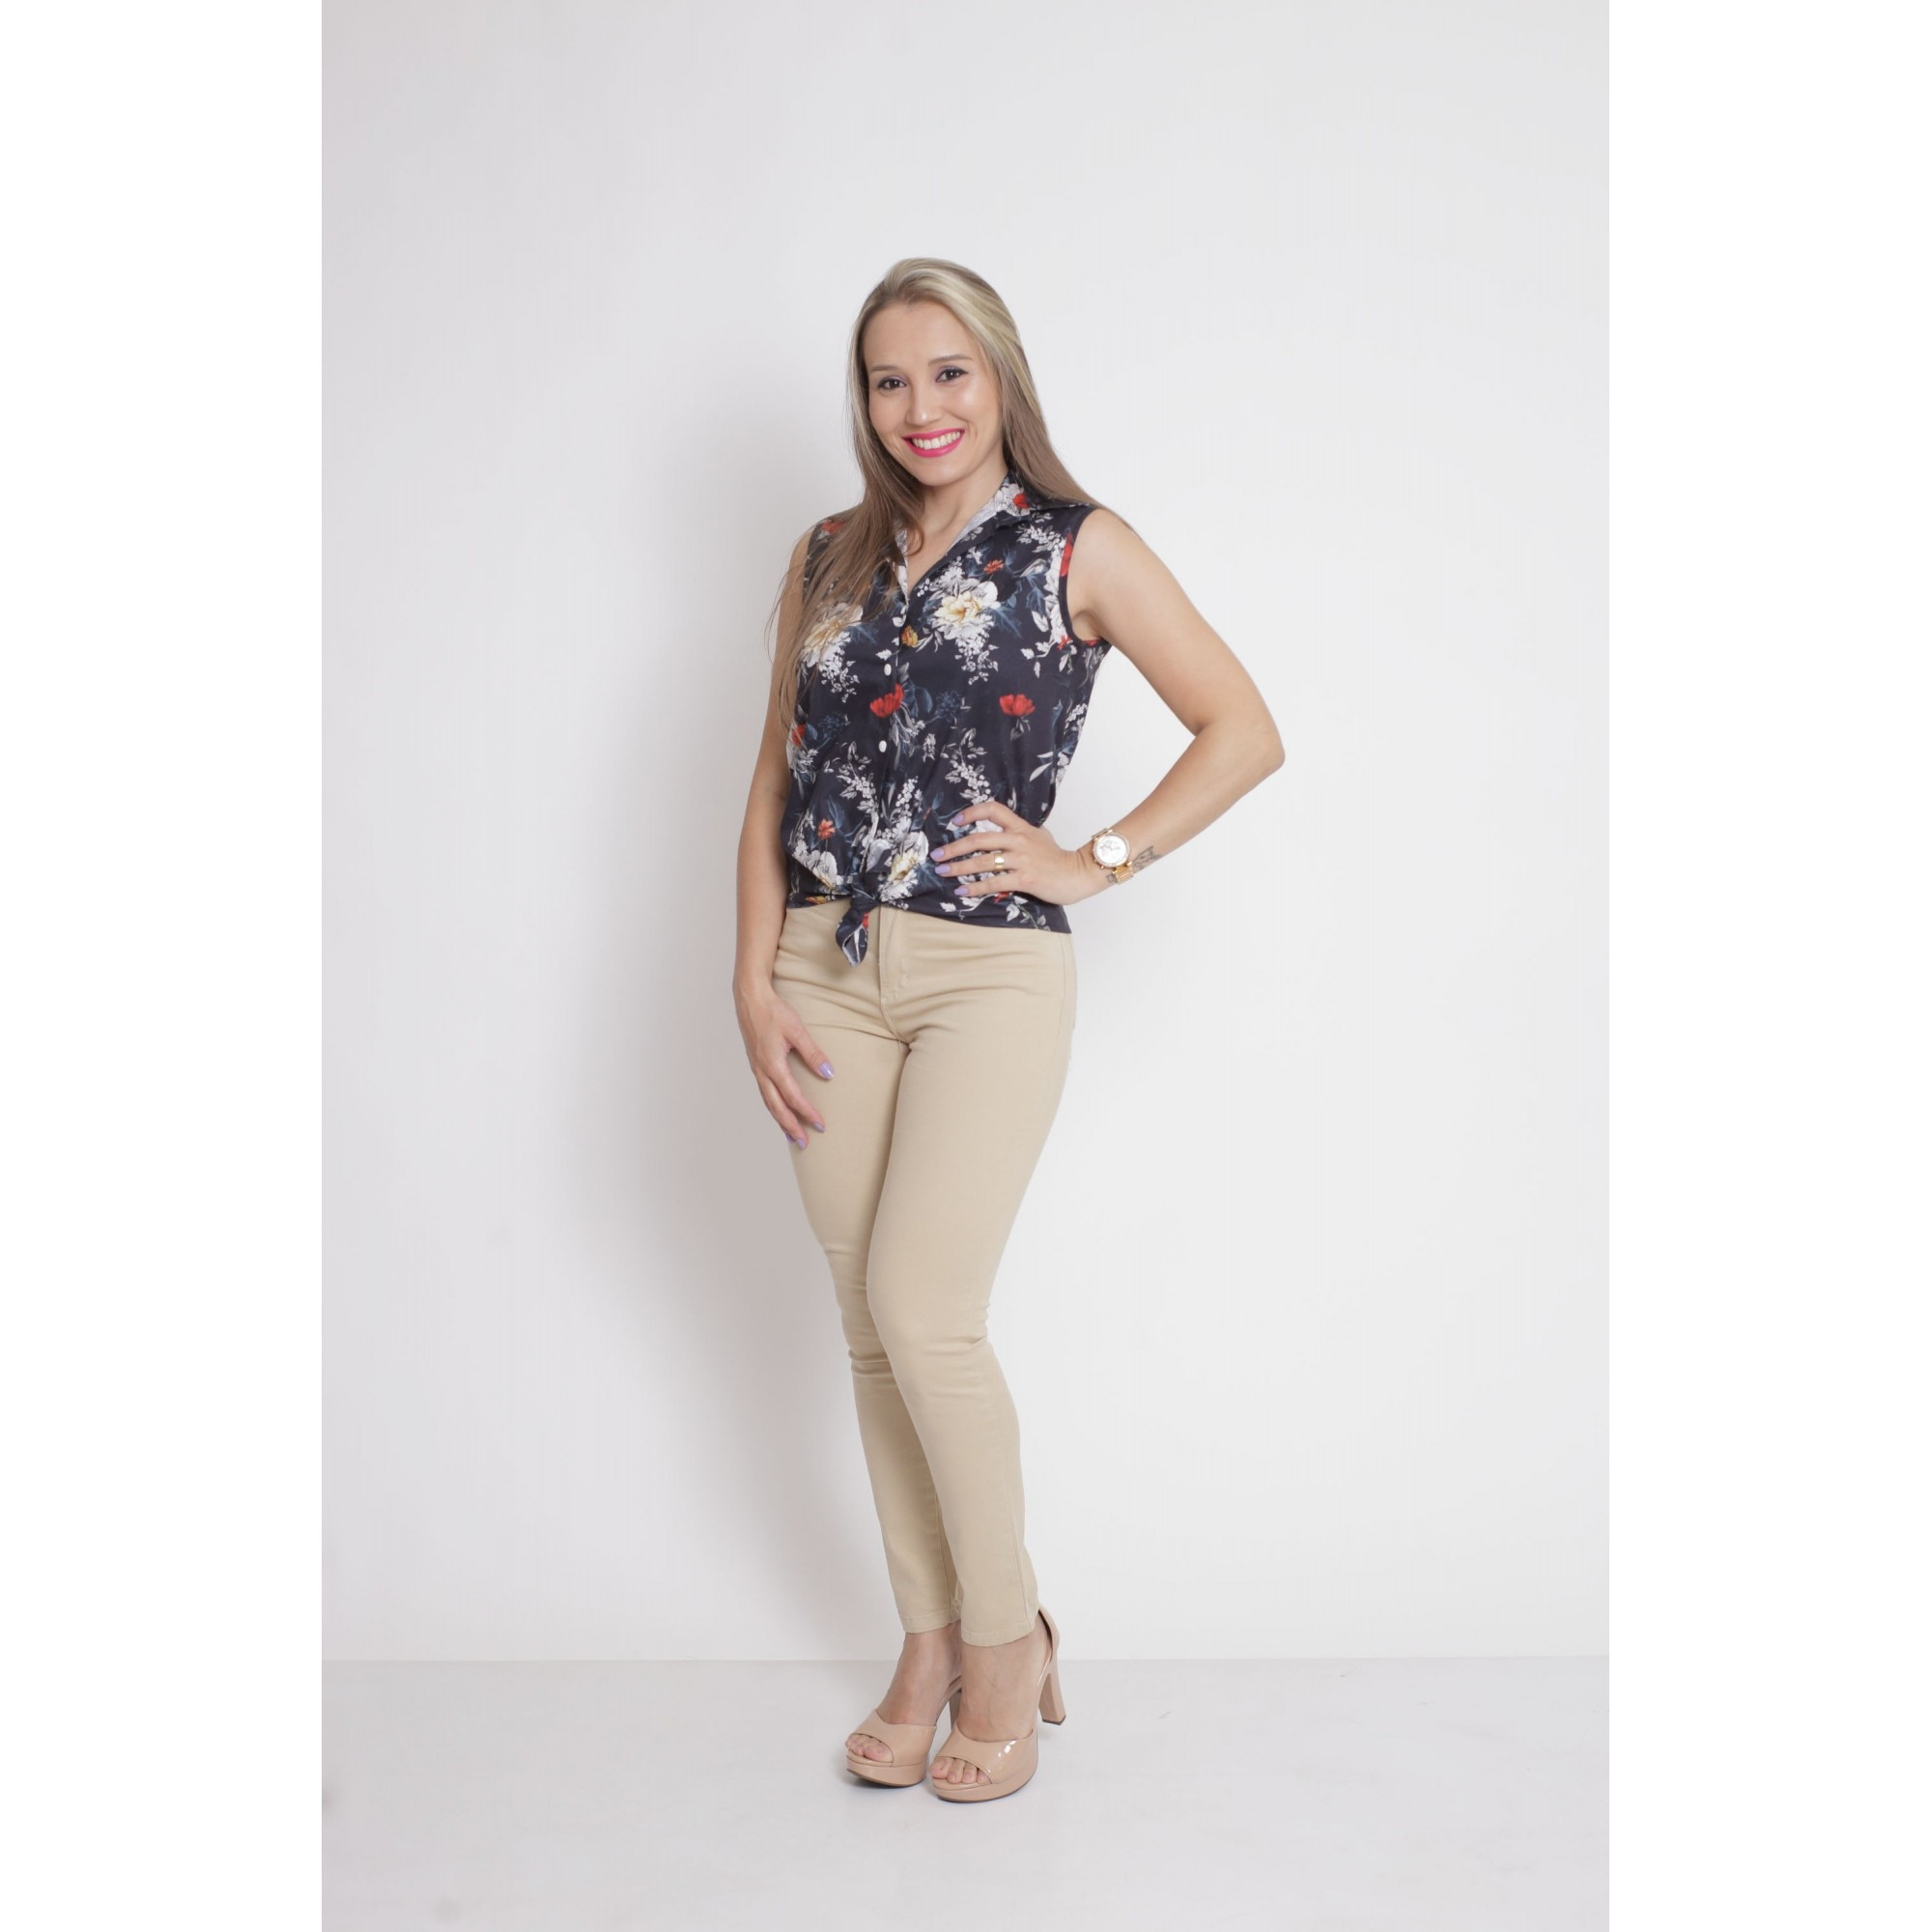 MÃE E FILHO > Kit 02 Camisas Social - Adulto + Infantil Preta Floral [Coleção Tal Mãe Tal Filho]  - Heitor Fashion Brazil